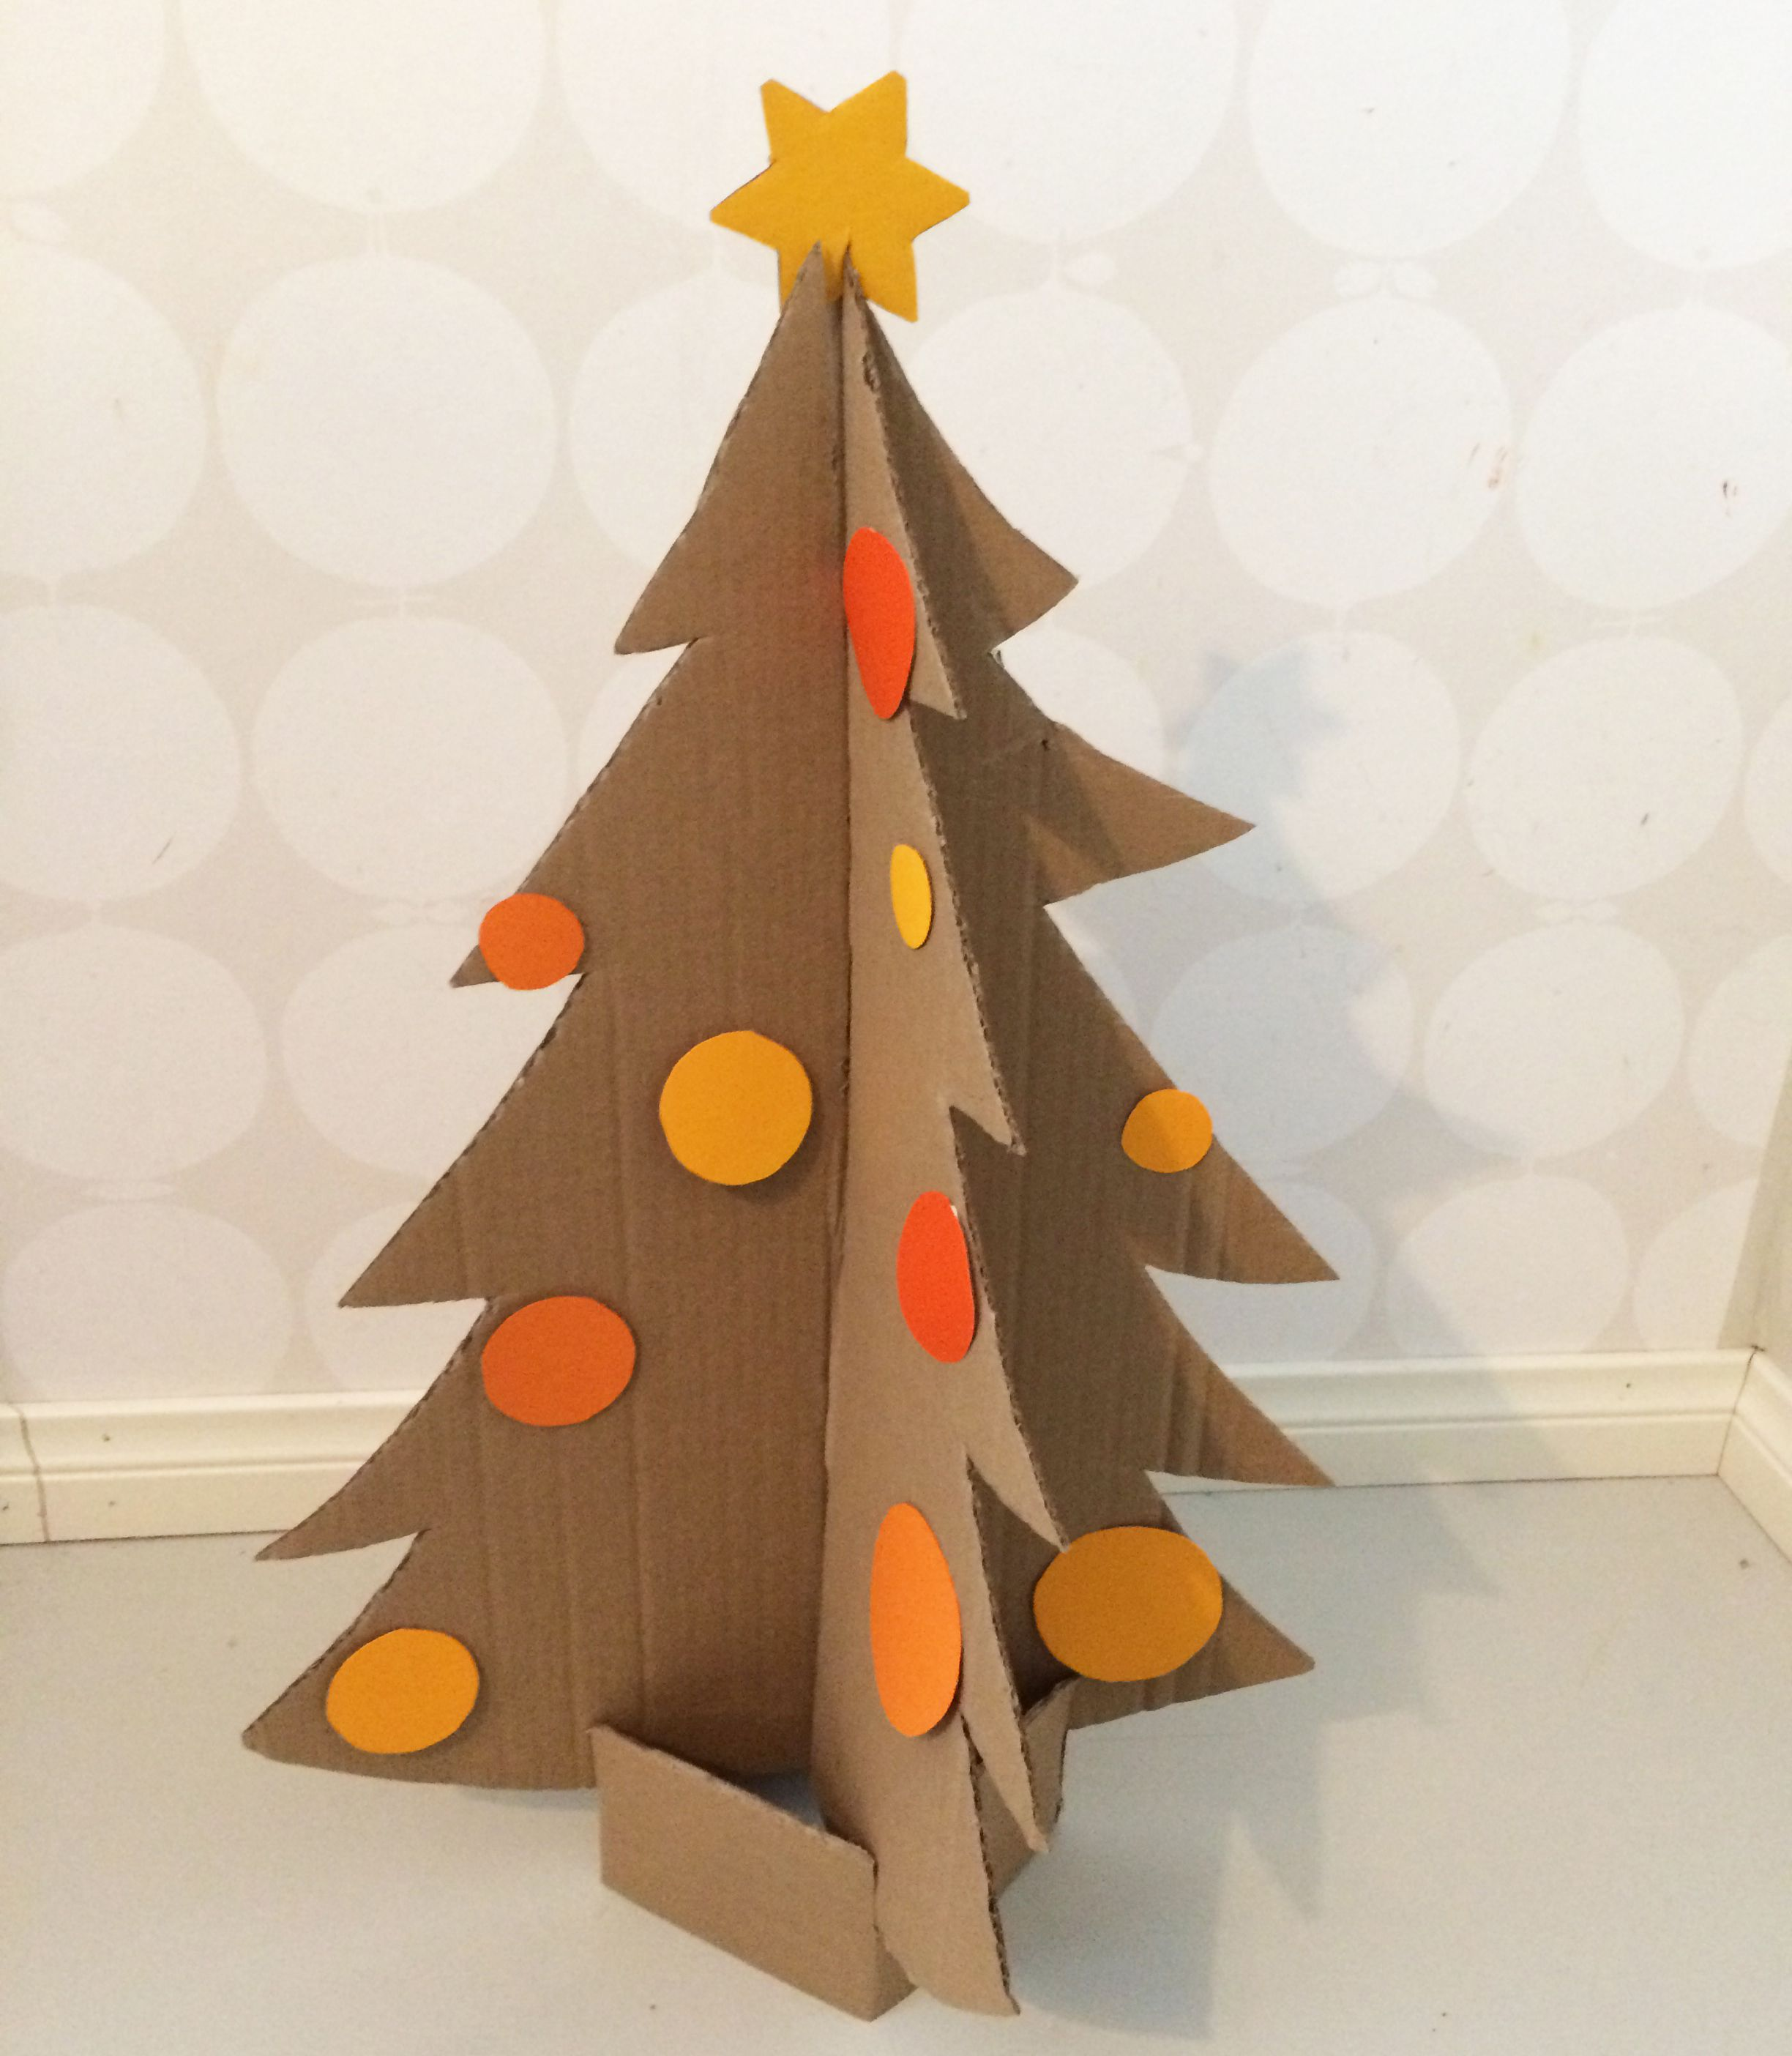 Christmas decorations ideas for kids - Lasten Lapset Askartelu Joulu K Sity T K Dentaidot Koti Kierr Tys